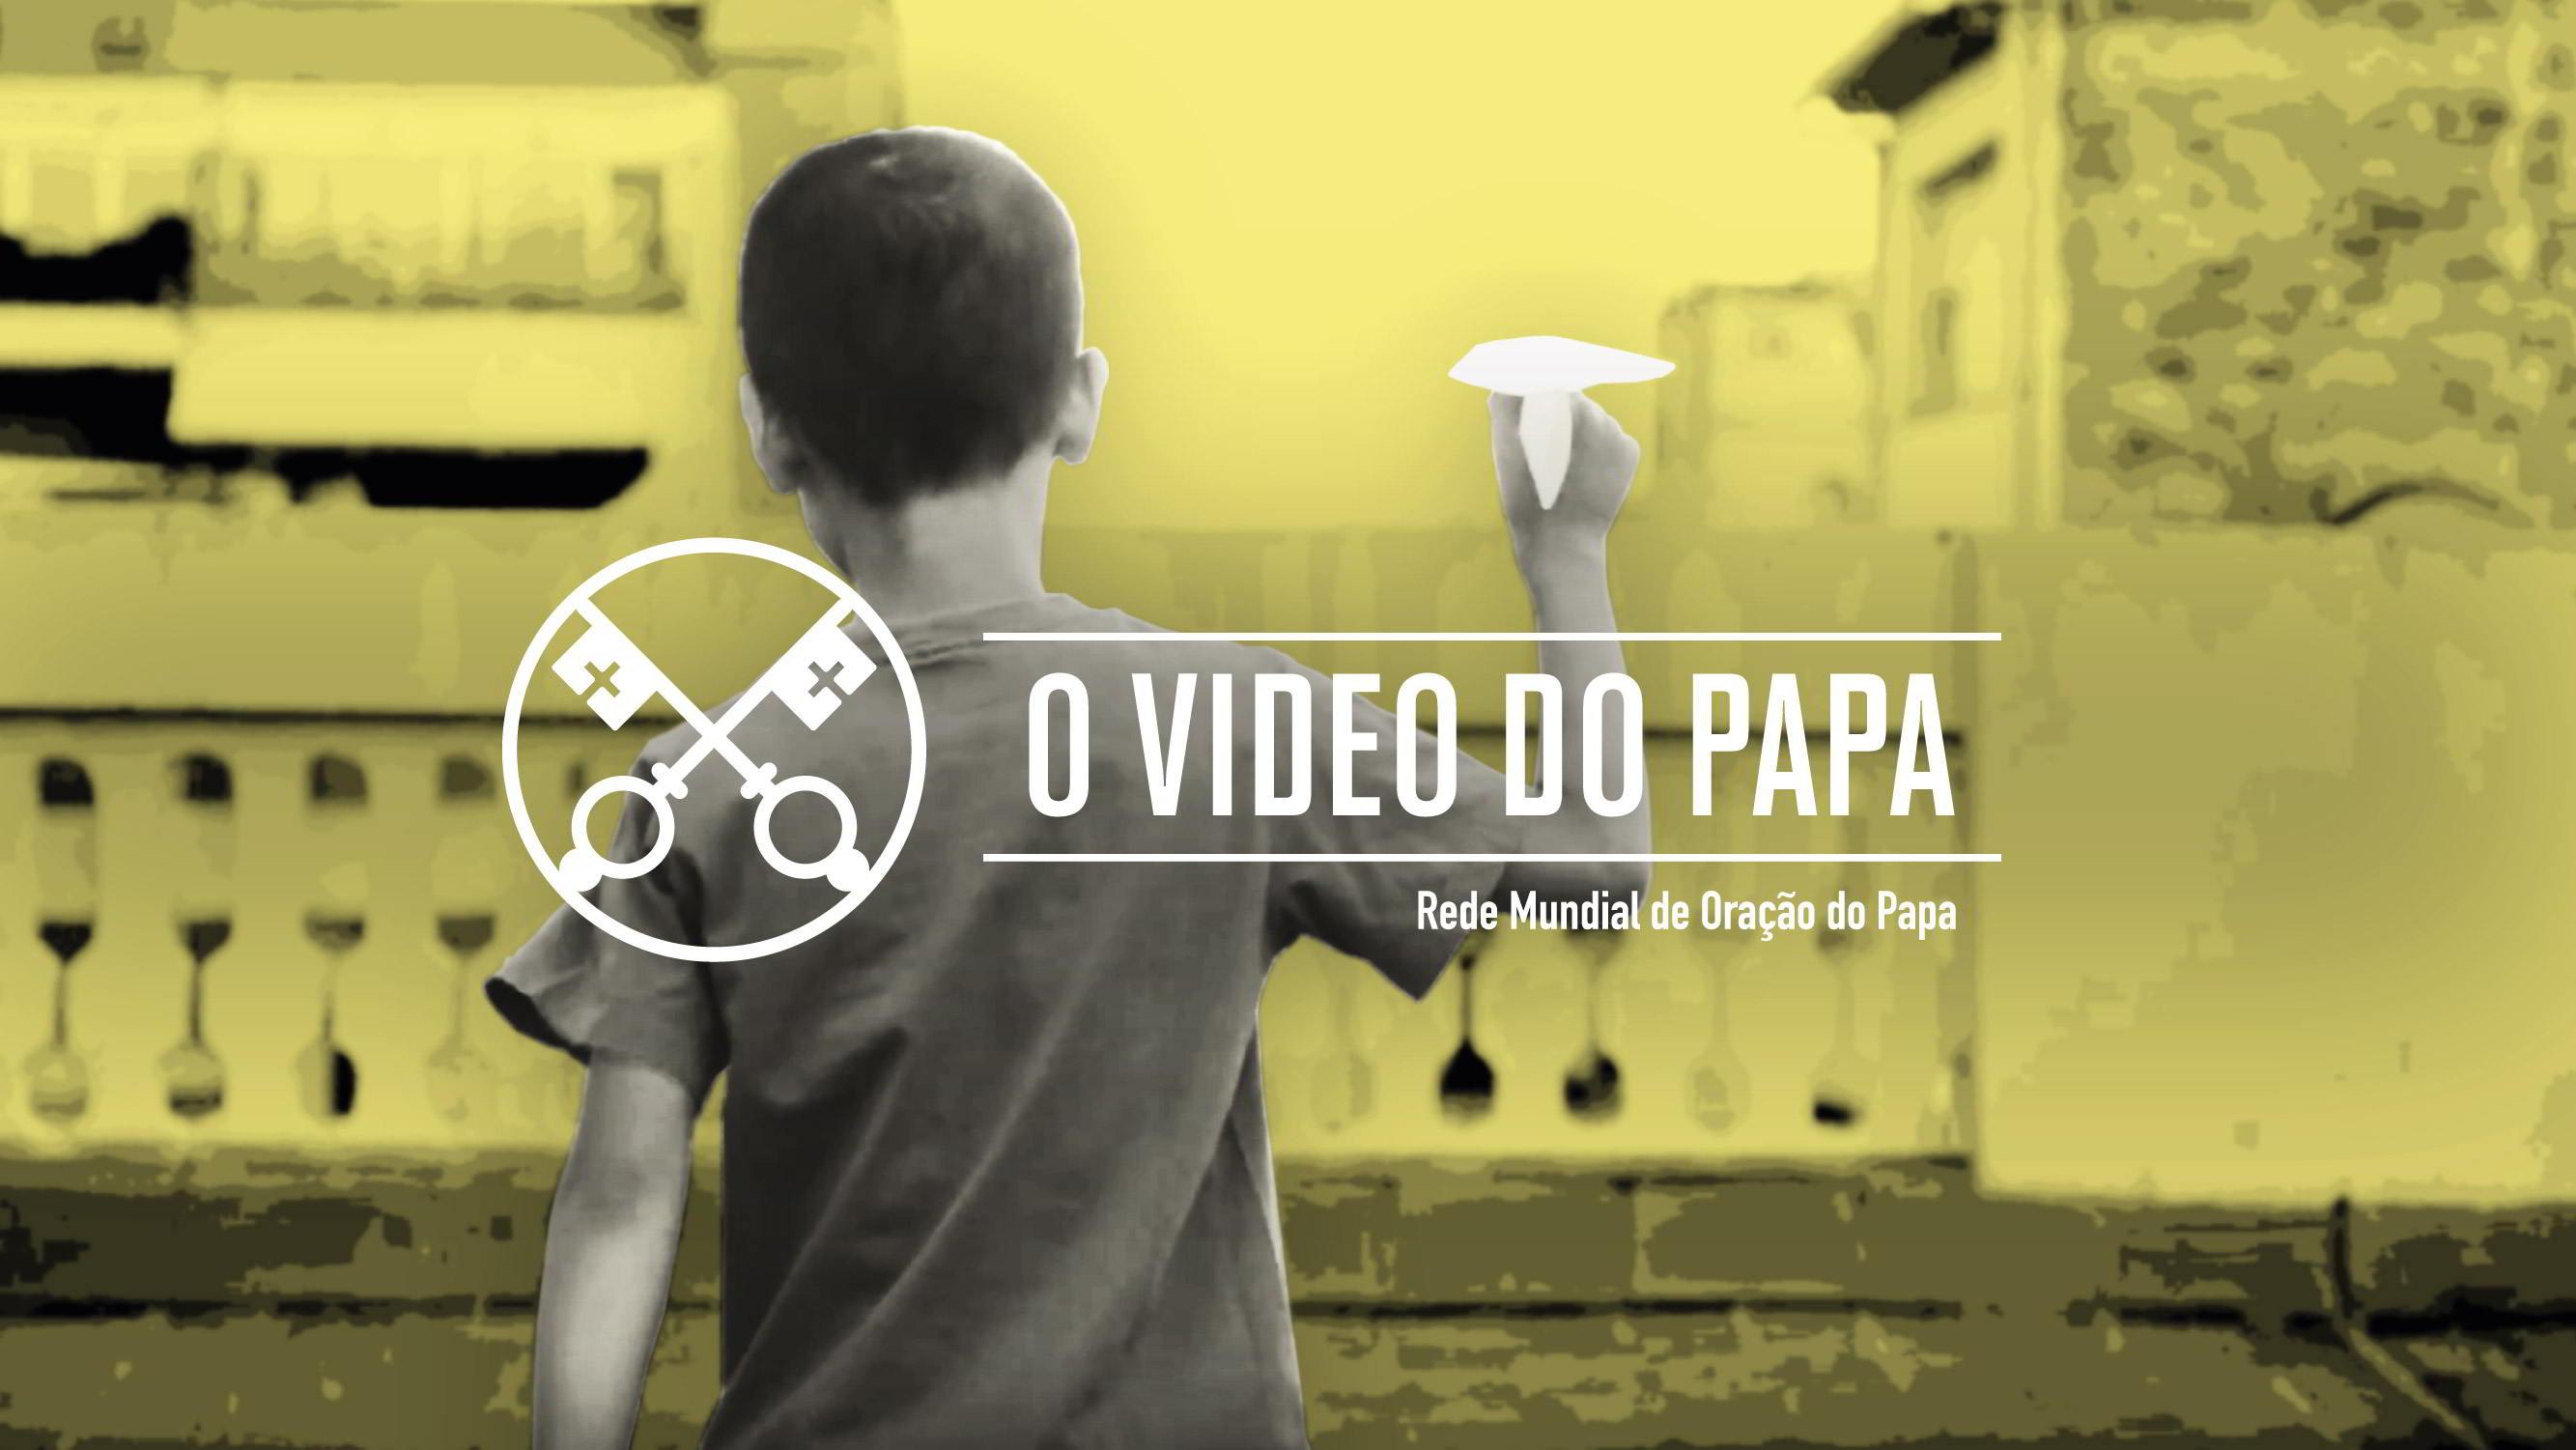 Official Image - TPV 10 2019 PT - O Video do Papa - Primavera missionaria na Igreja